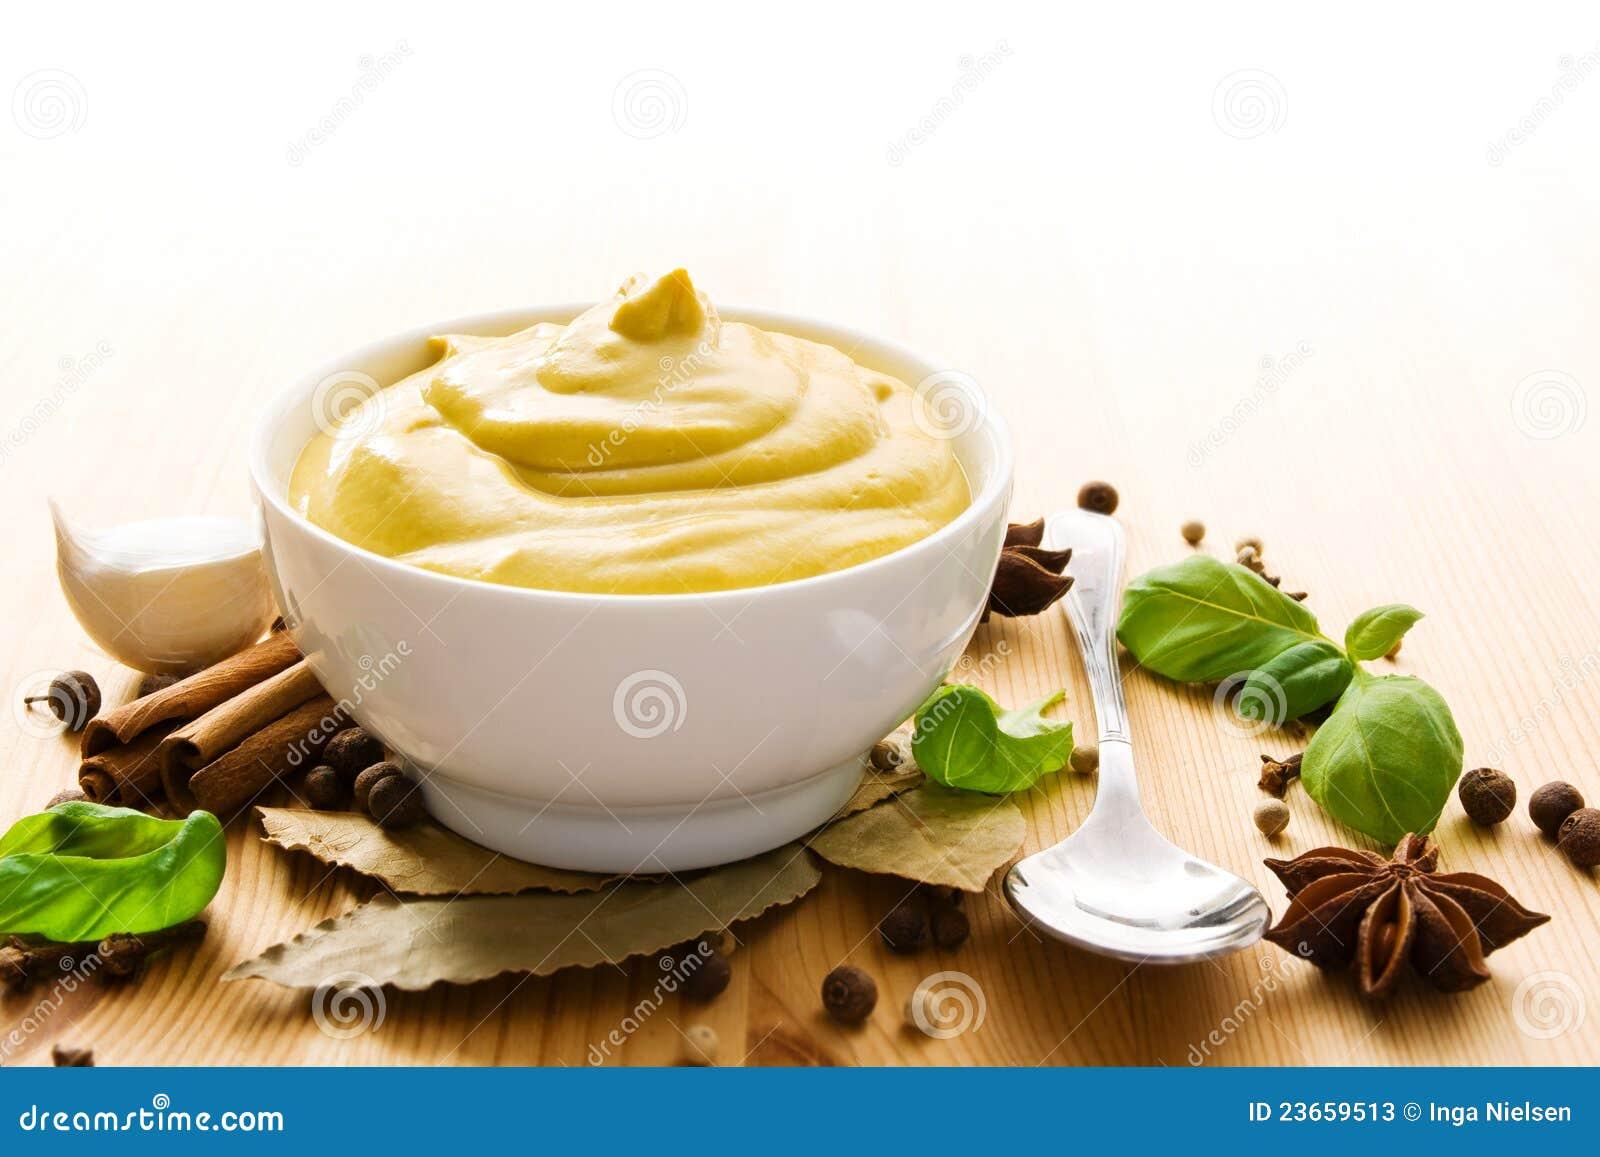 Mustard in bowl